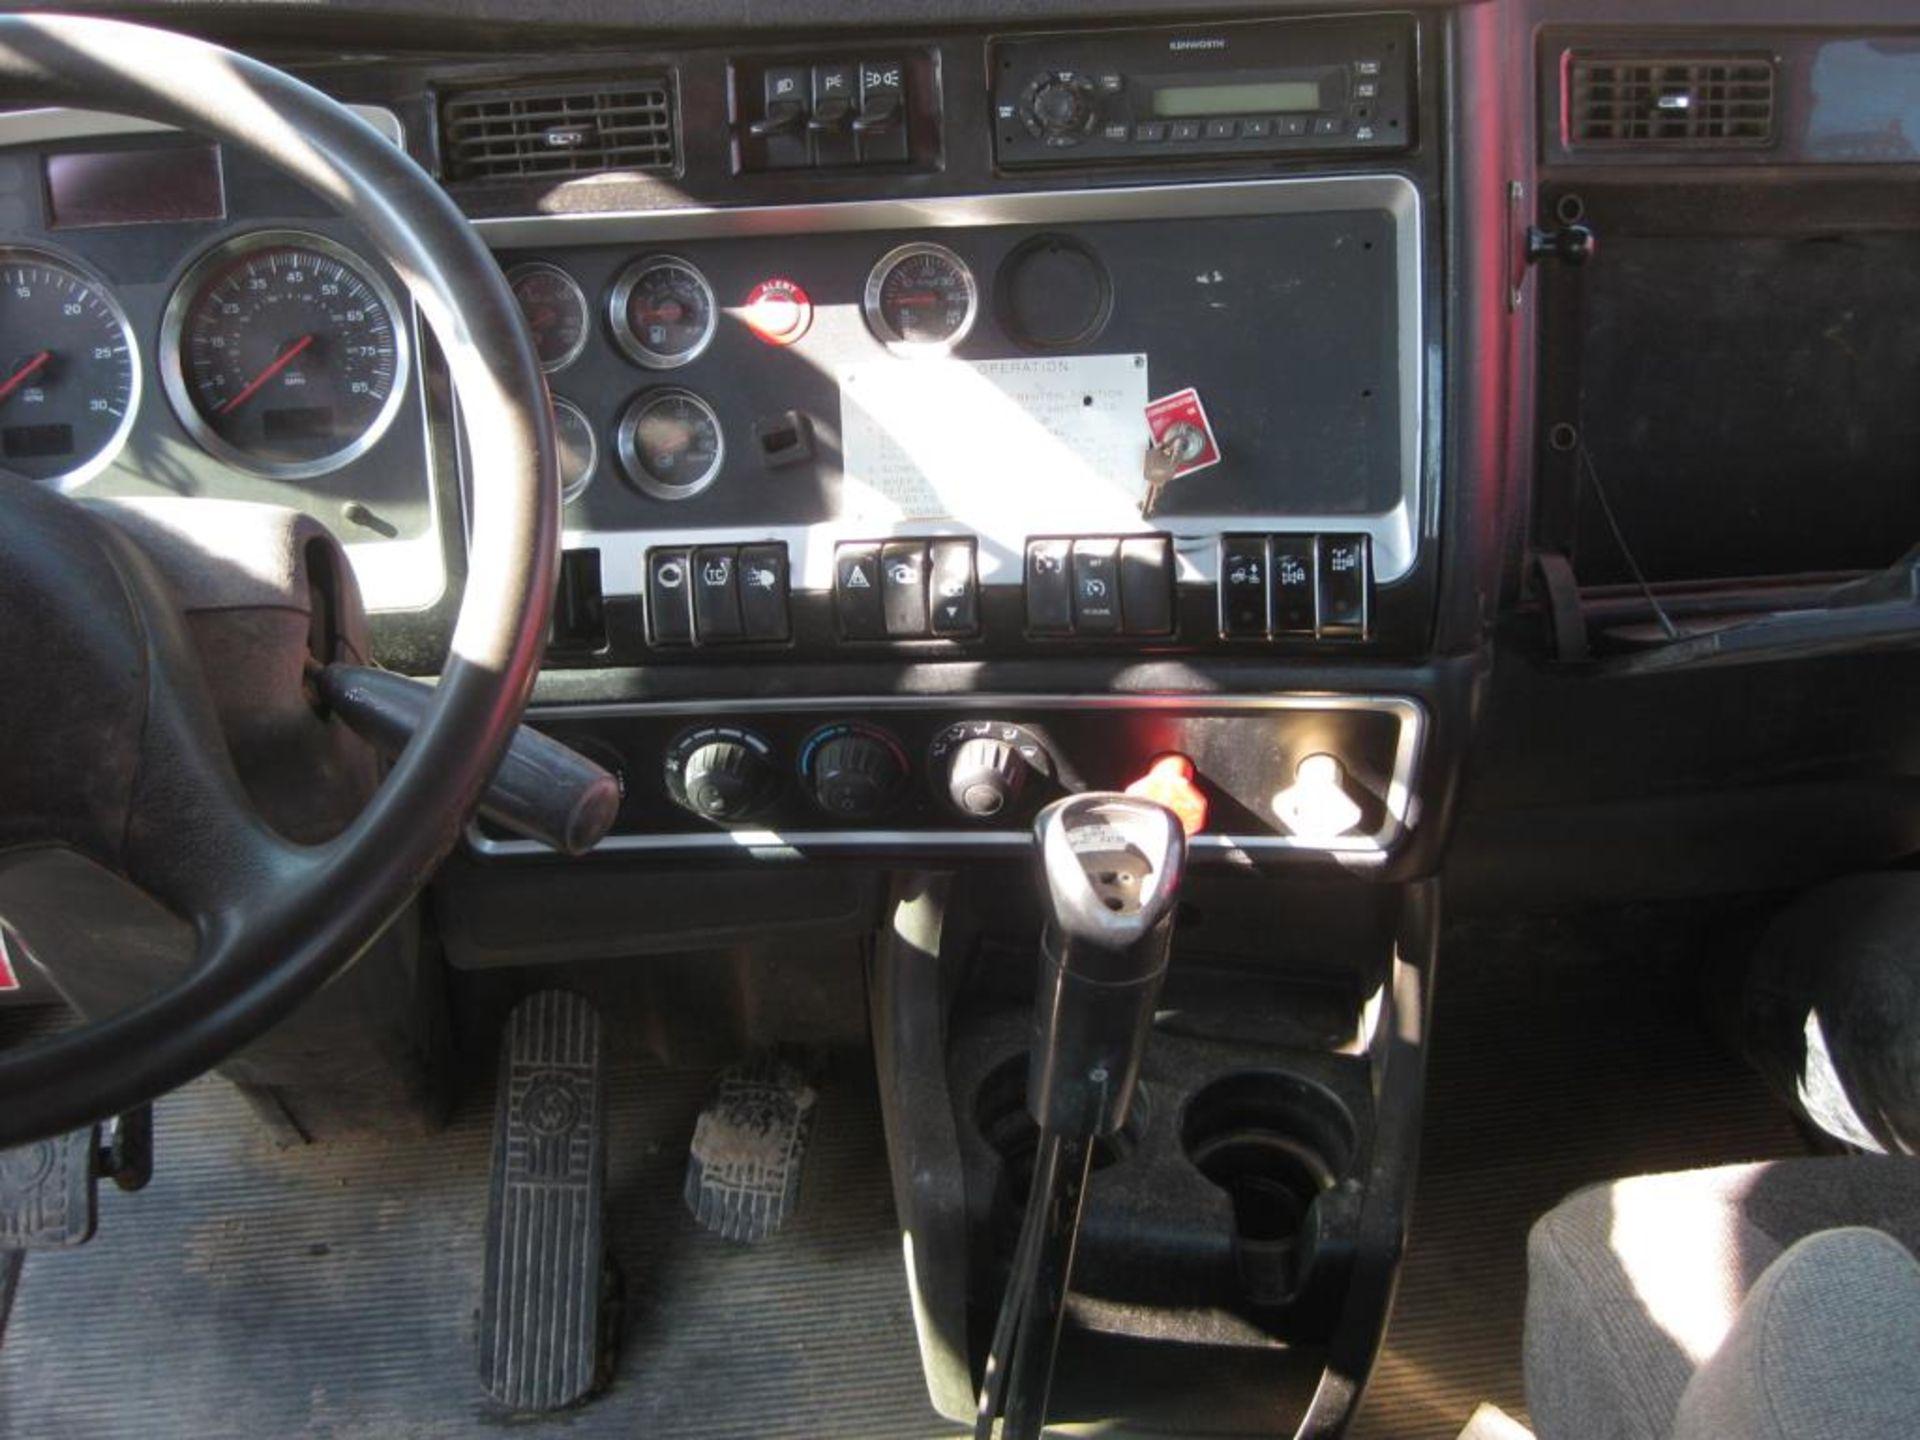 Kenworth Winch Truck - Image 18 of 27